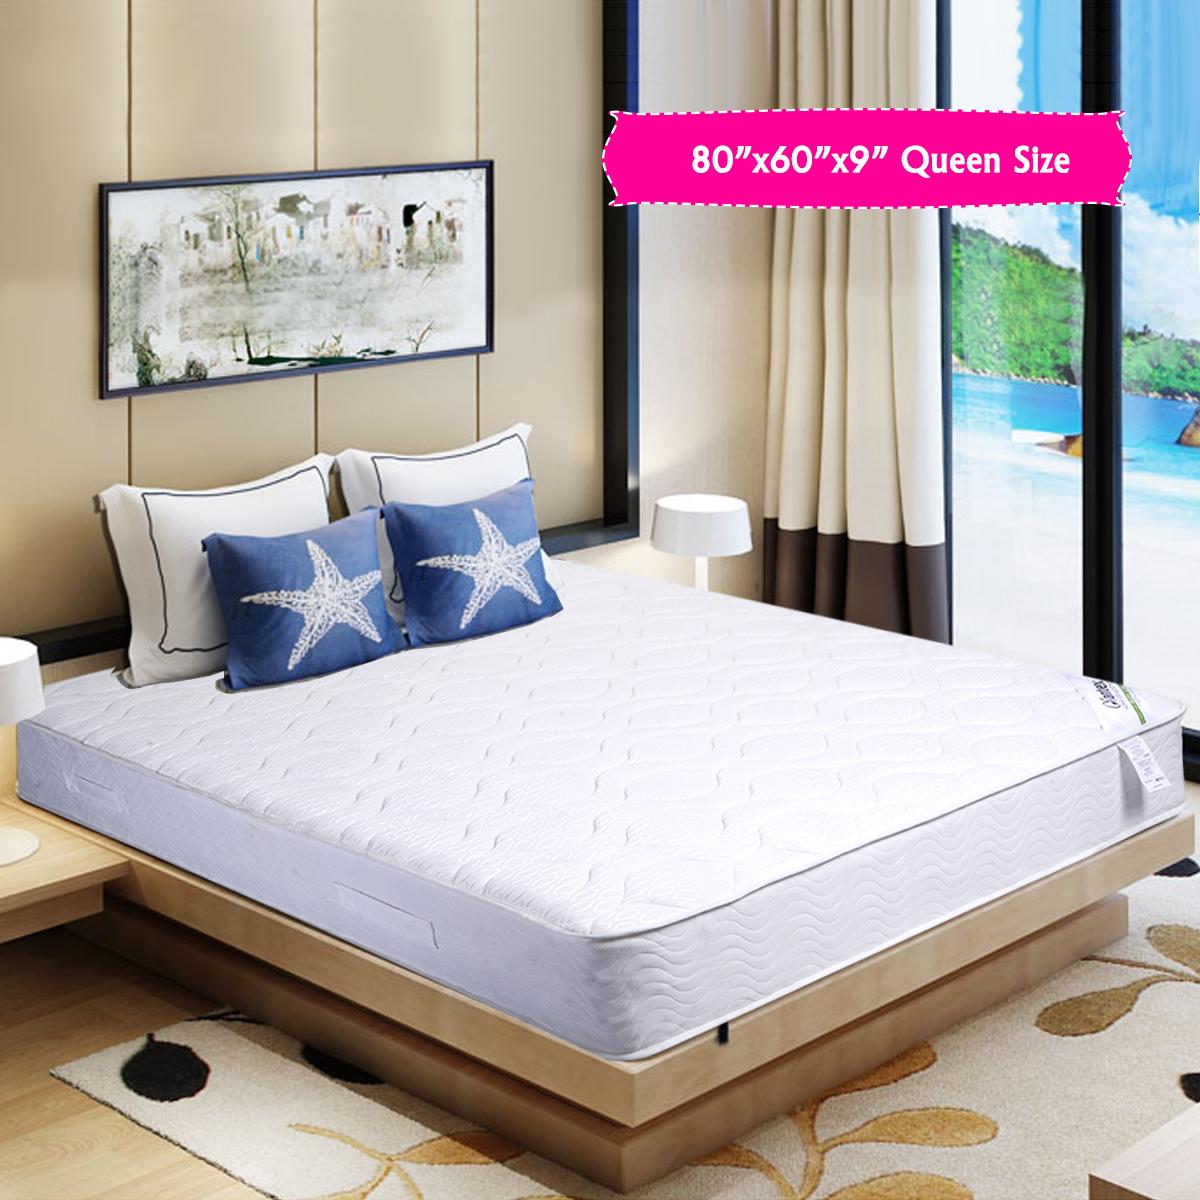 "Costway 9"" Mattress Independent Pocket Spring Mattress Bunk Bed (Queen) by Costway"